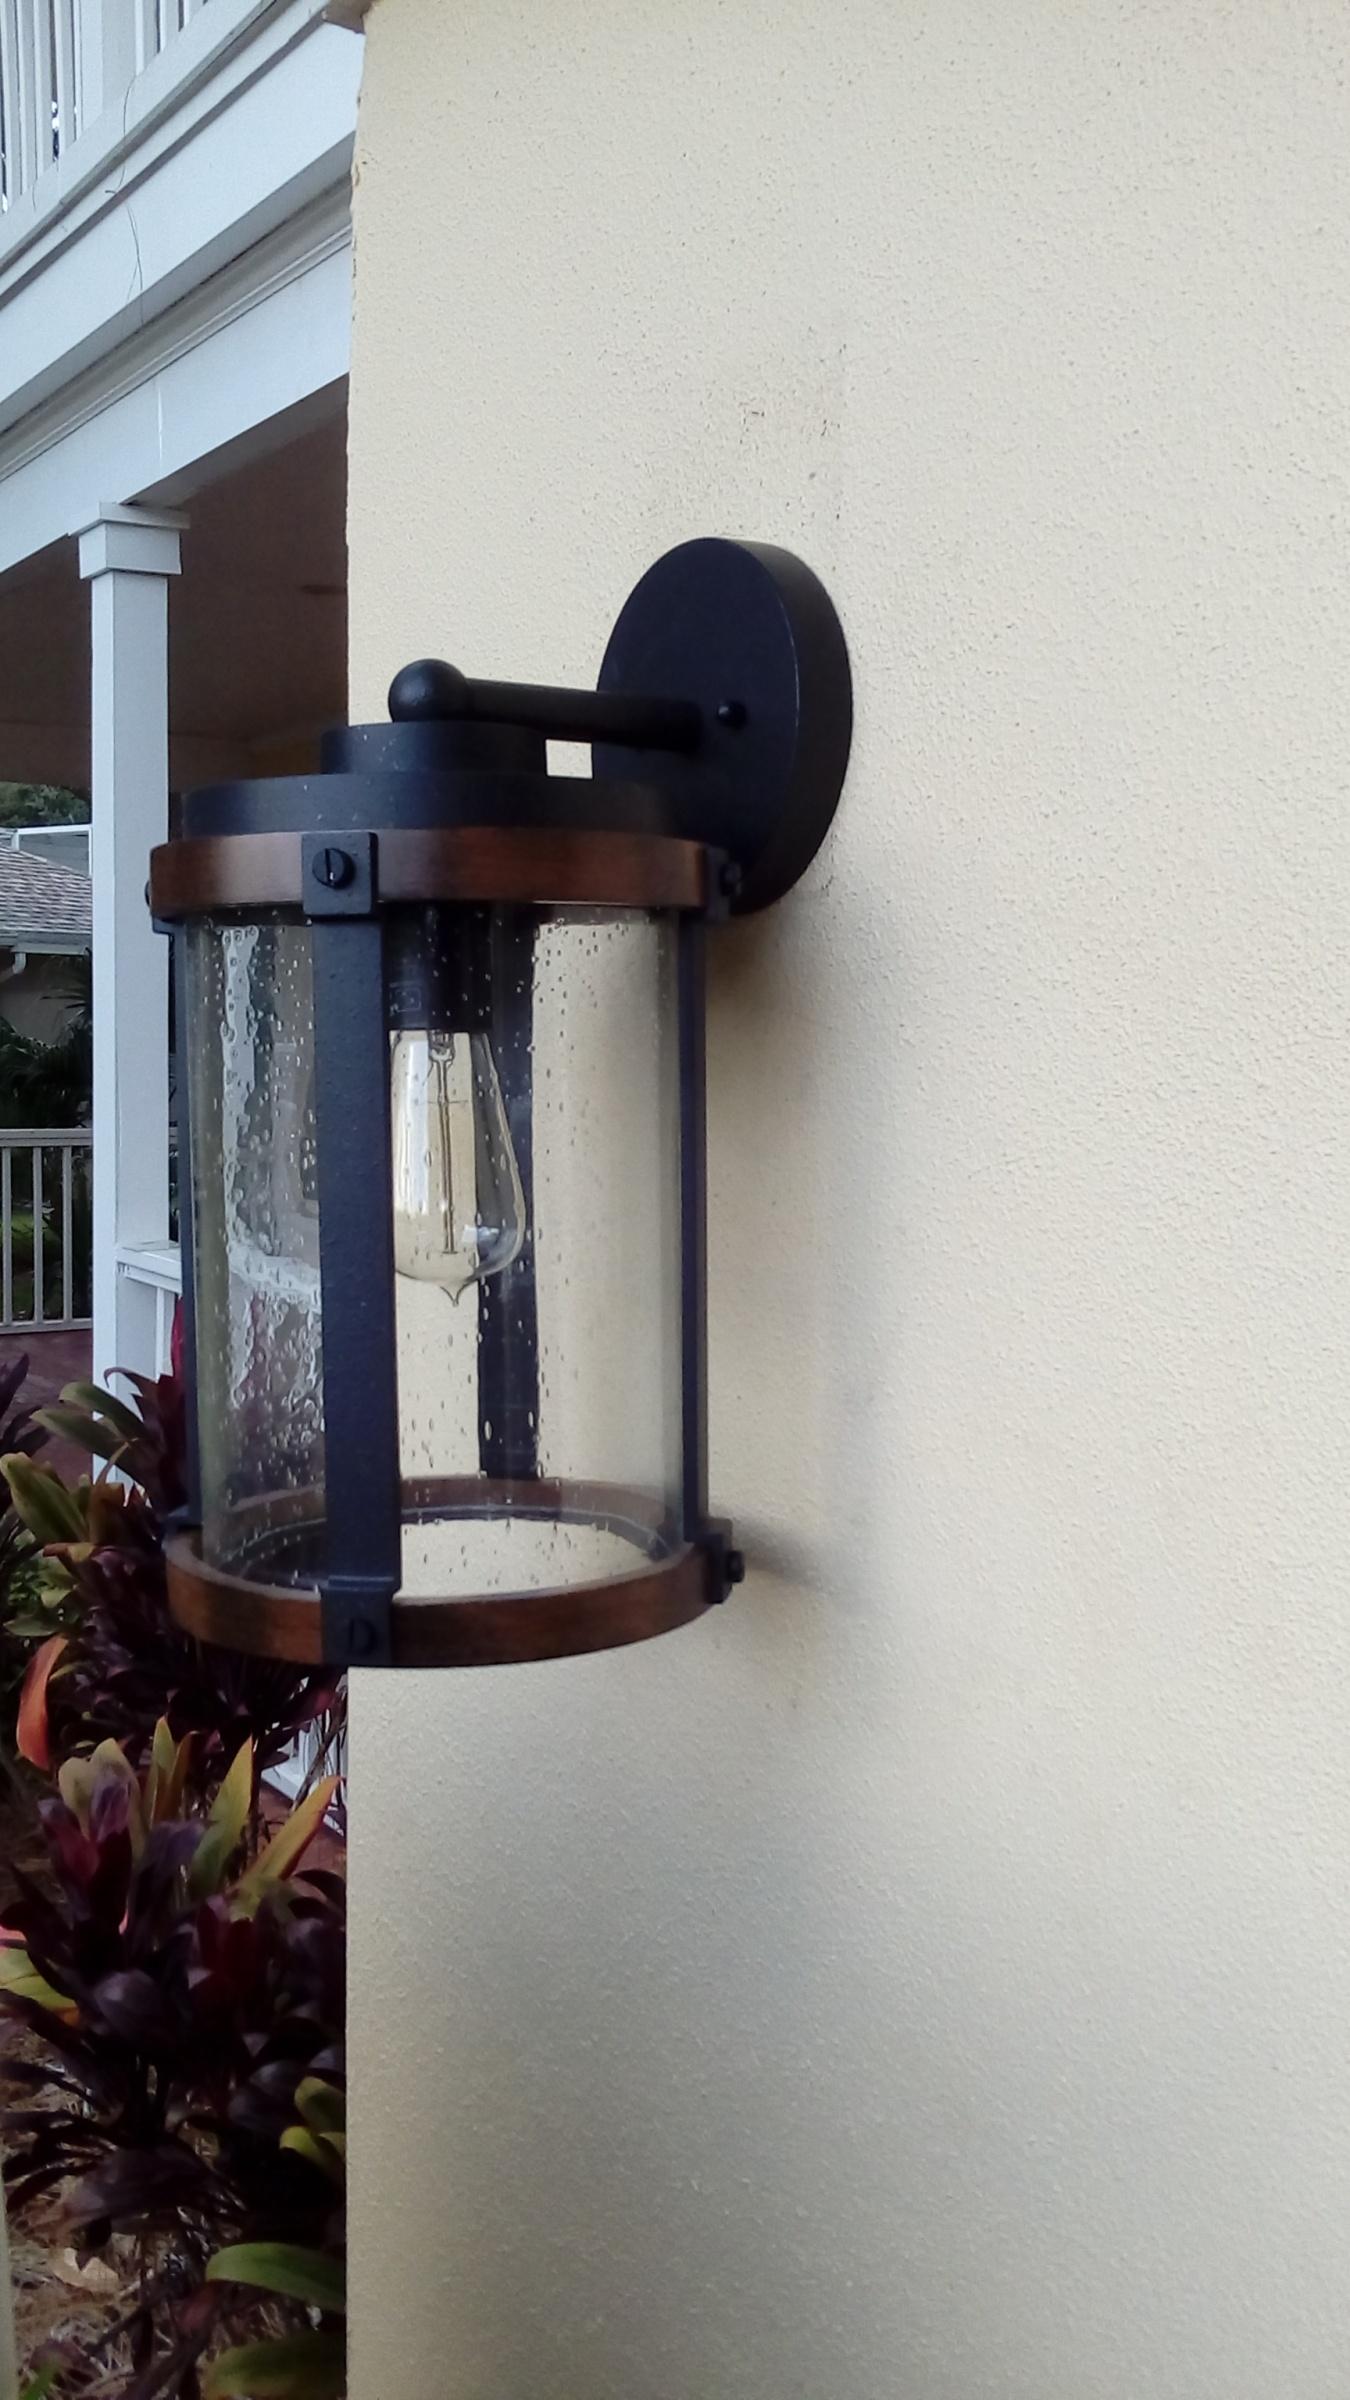 Outdoor Exterior Wet Rated Lighting Electrical Diy Chatroom Home Is It Possible Improvement Forum Img 20180918 143516 Jmig7 Offline